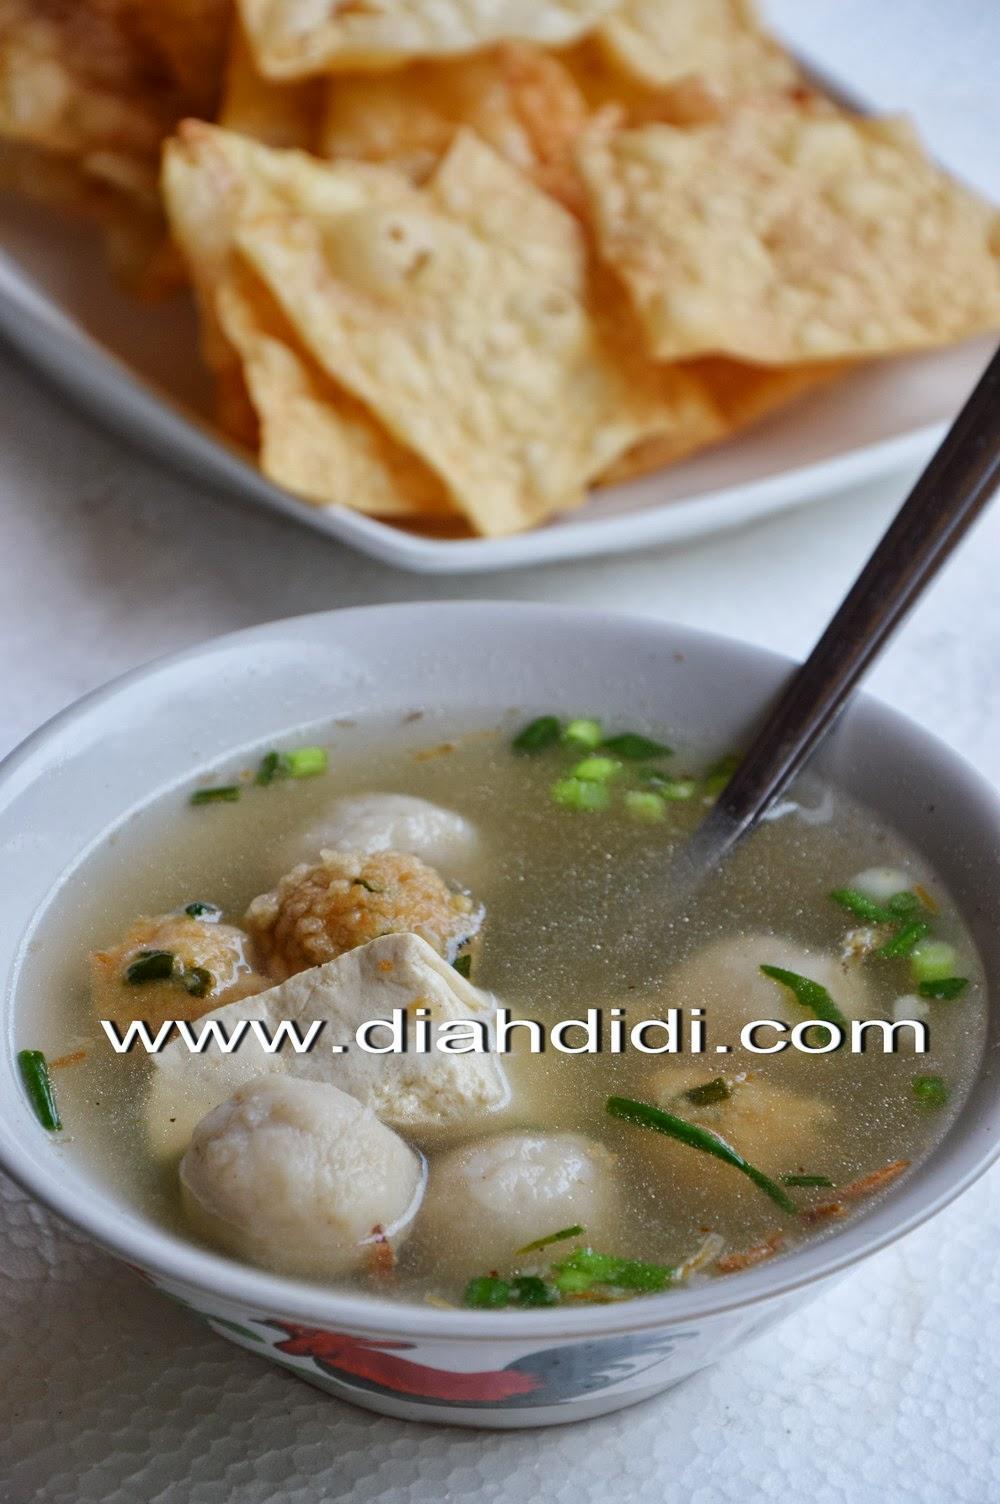 Resep Bakso Ikan Tenggiri : resep, bakso, tenggiri, Didi's, Kitchen:, Bakso, Homemade